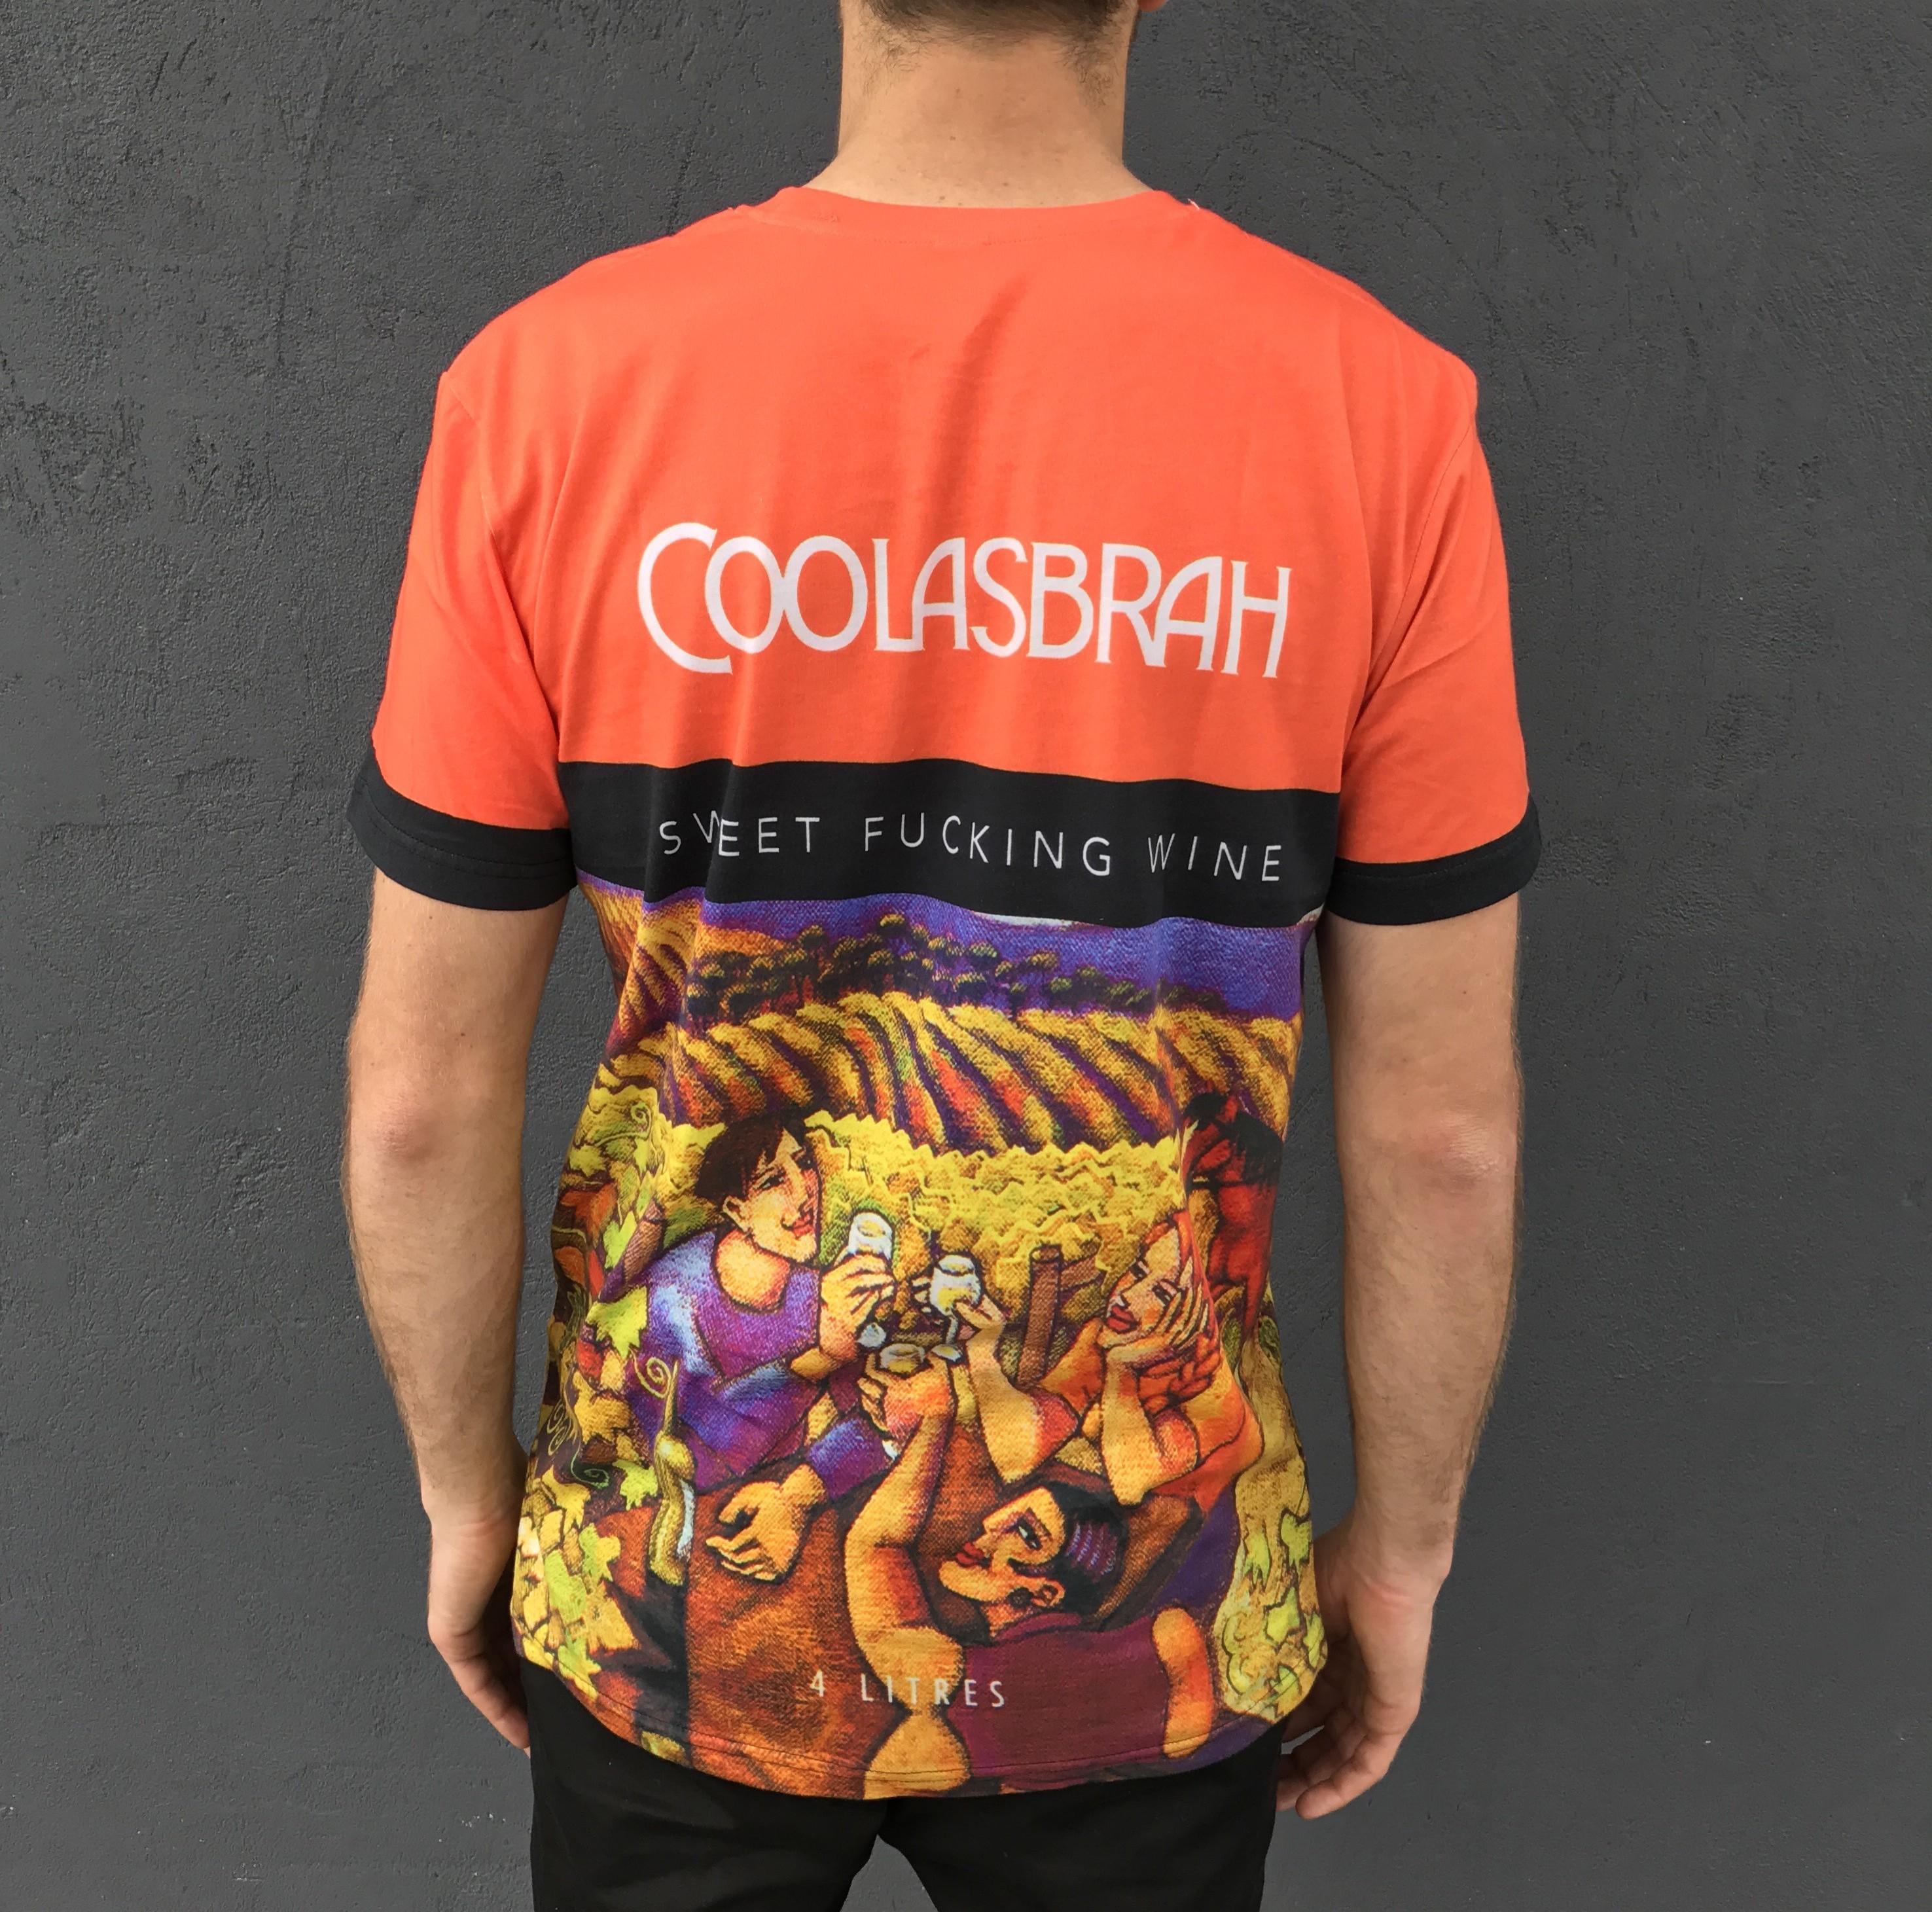 FULL PRINT COOLASBRAH TEE